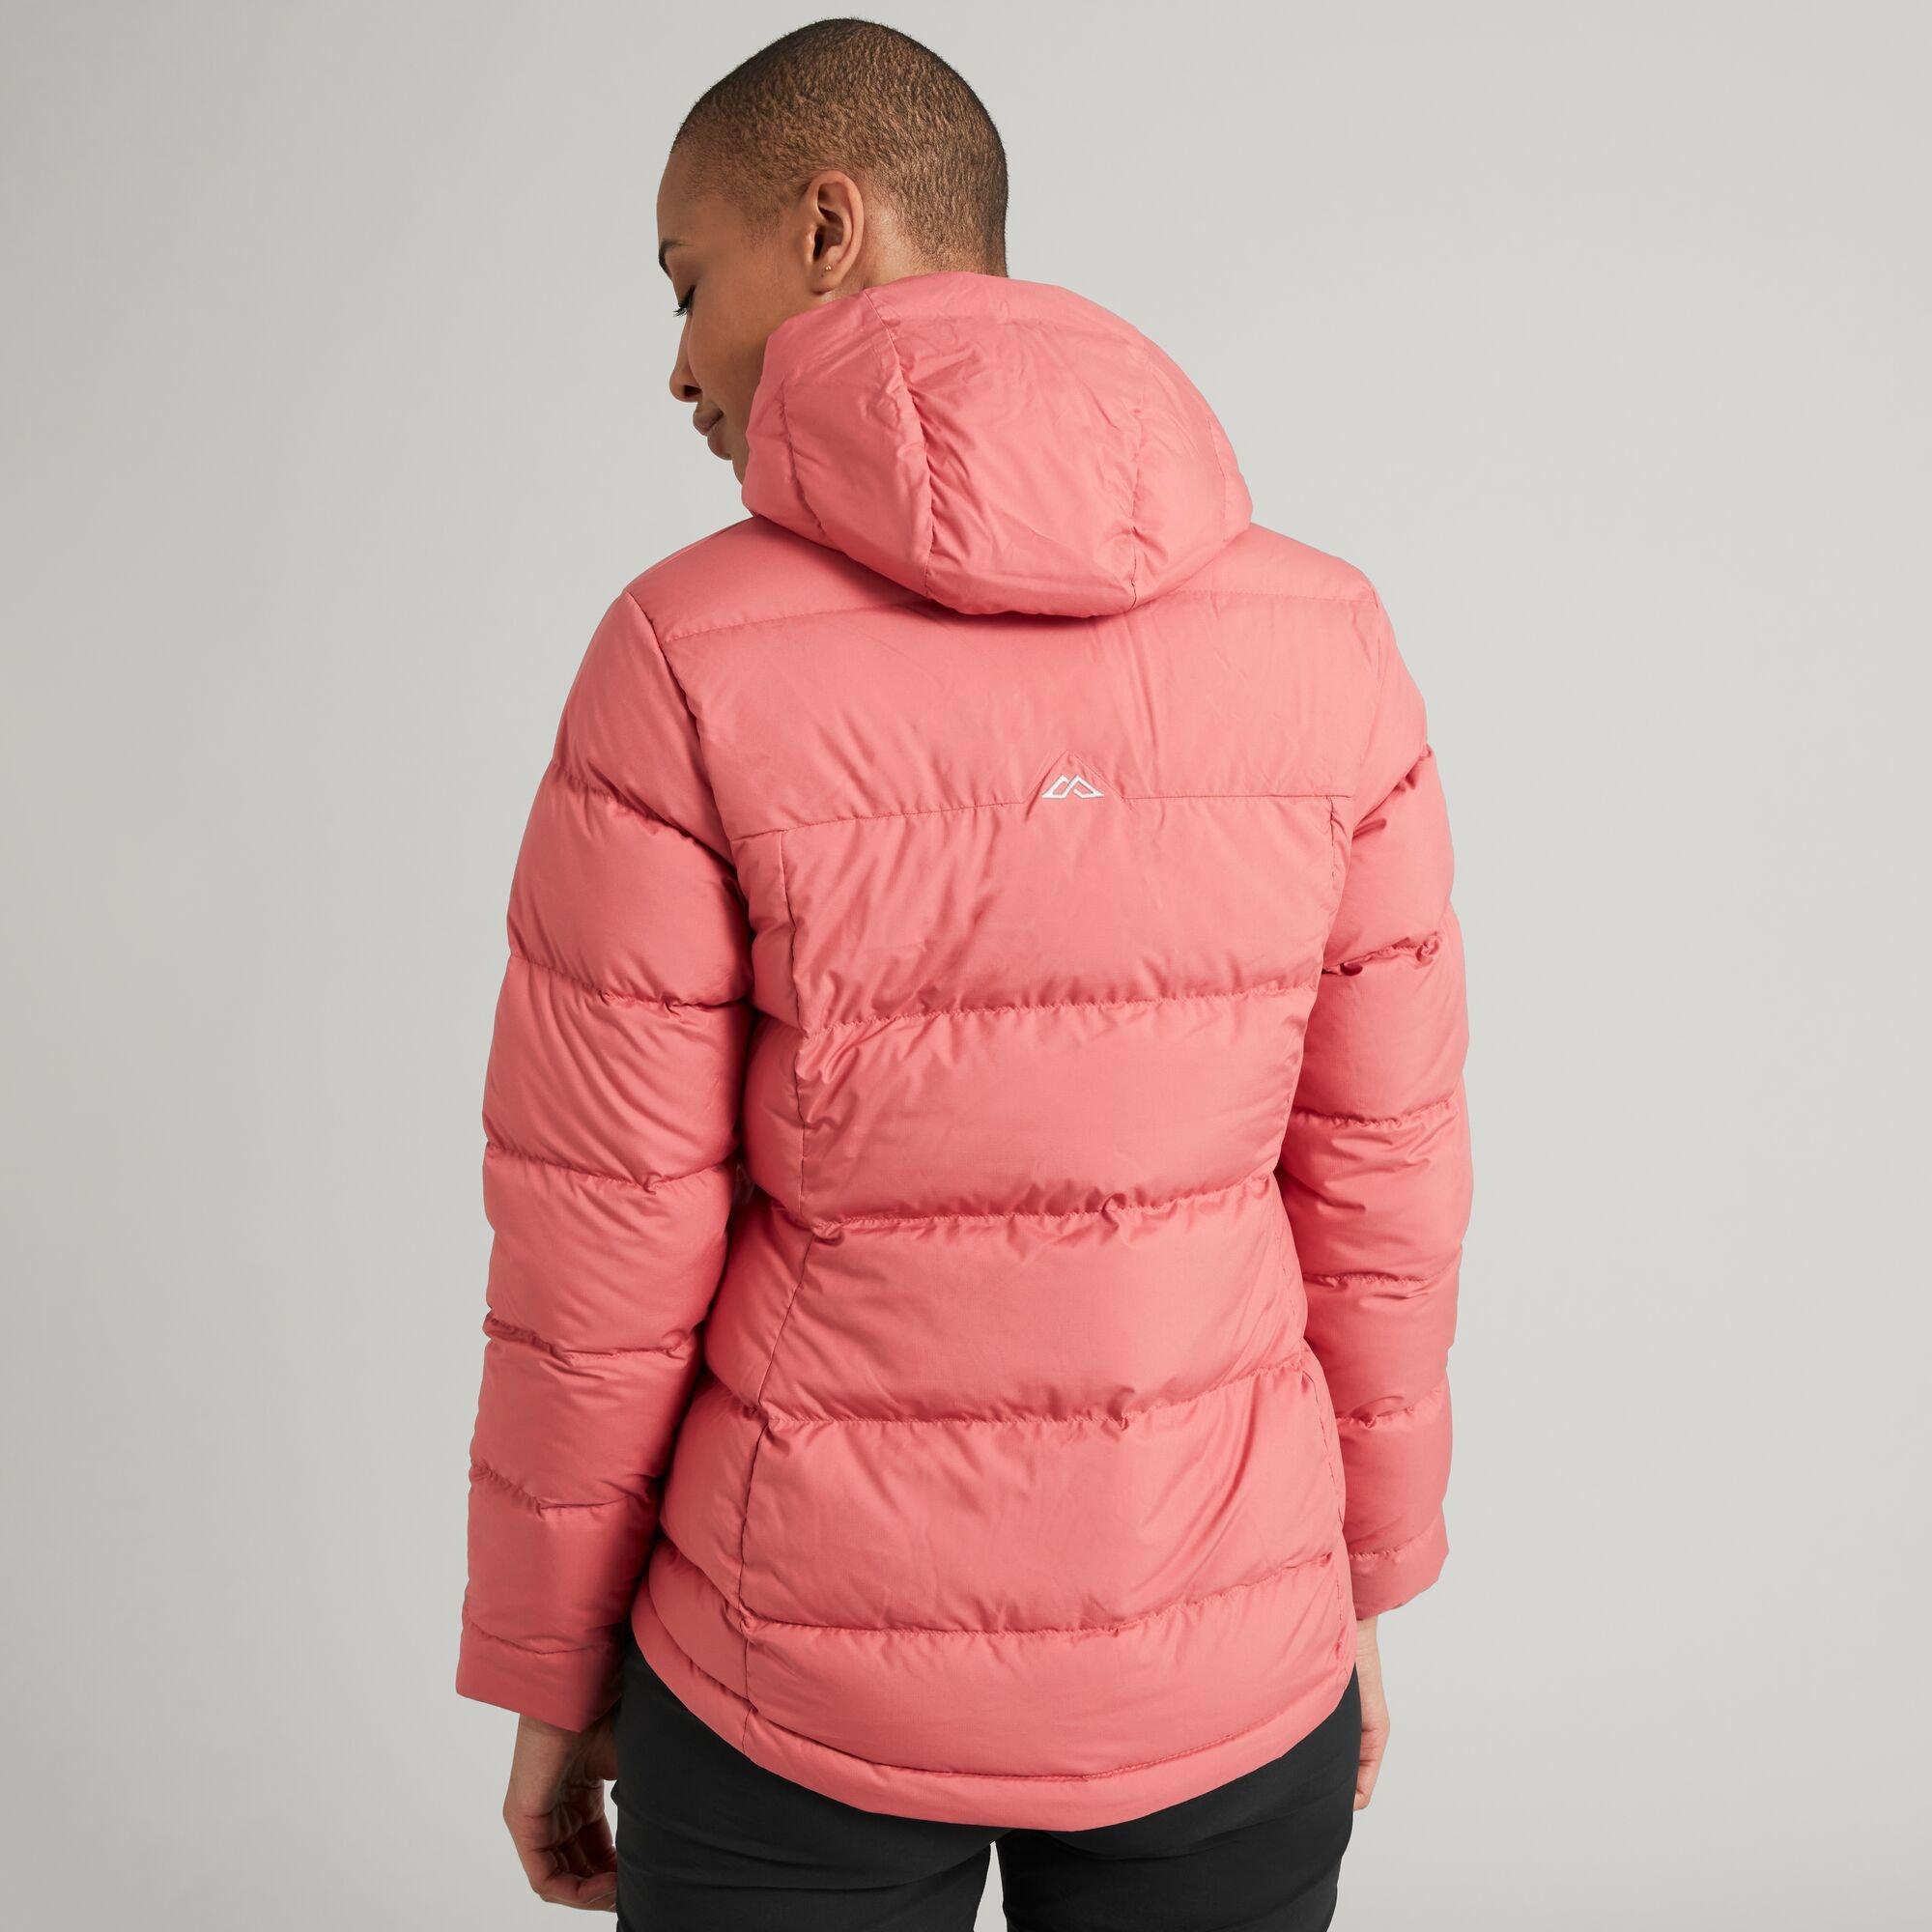 thumbnail 31 - NEW Kathmandu Epiq Womens Hooded Down Puffer 600 Fill Warm Outdoor Winter Jacket